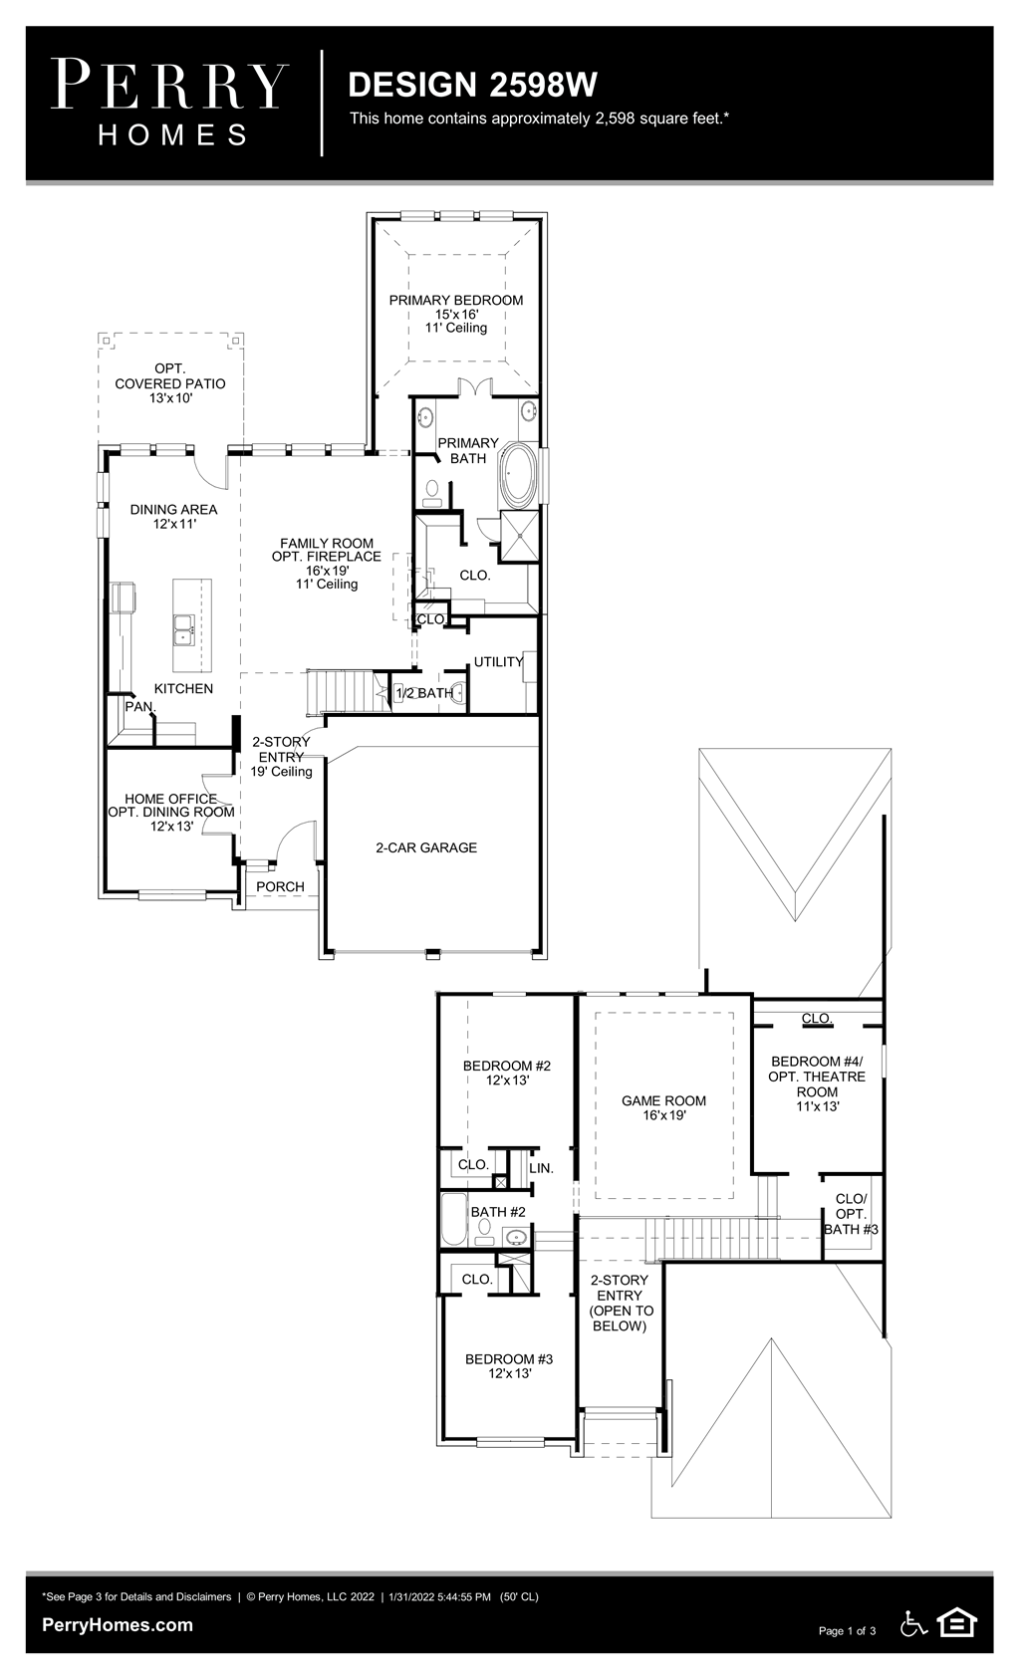 Floor Plan for 2598W